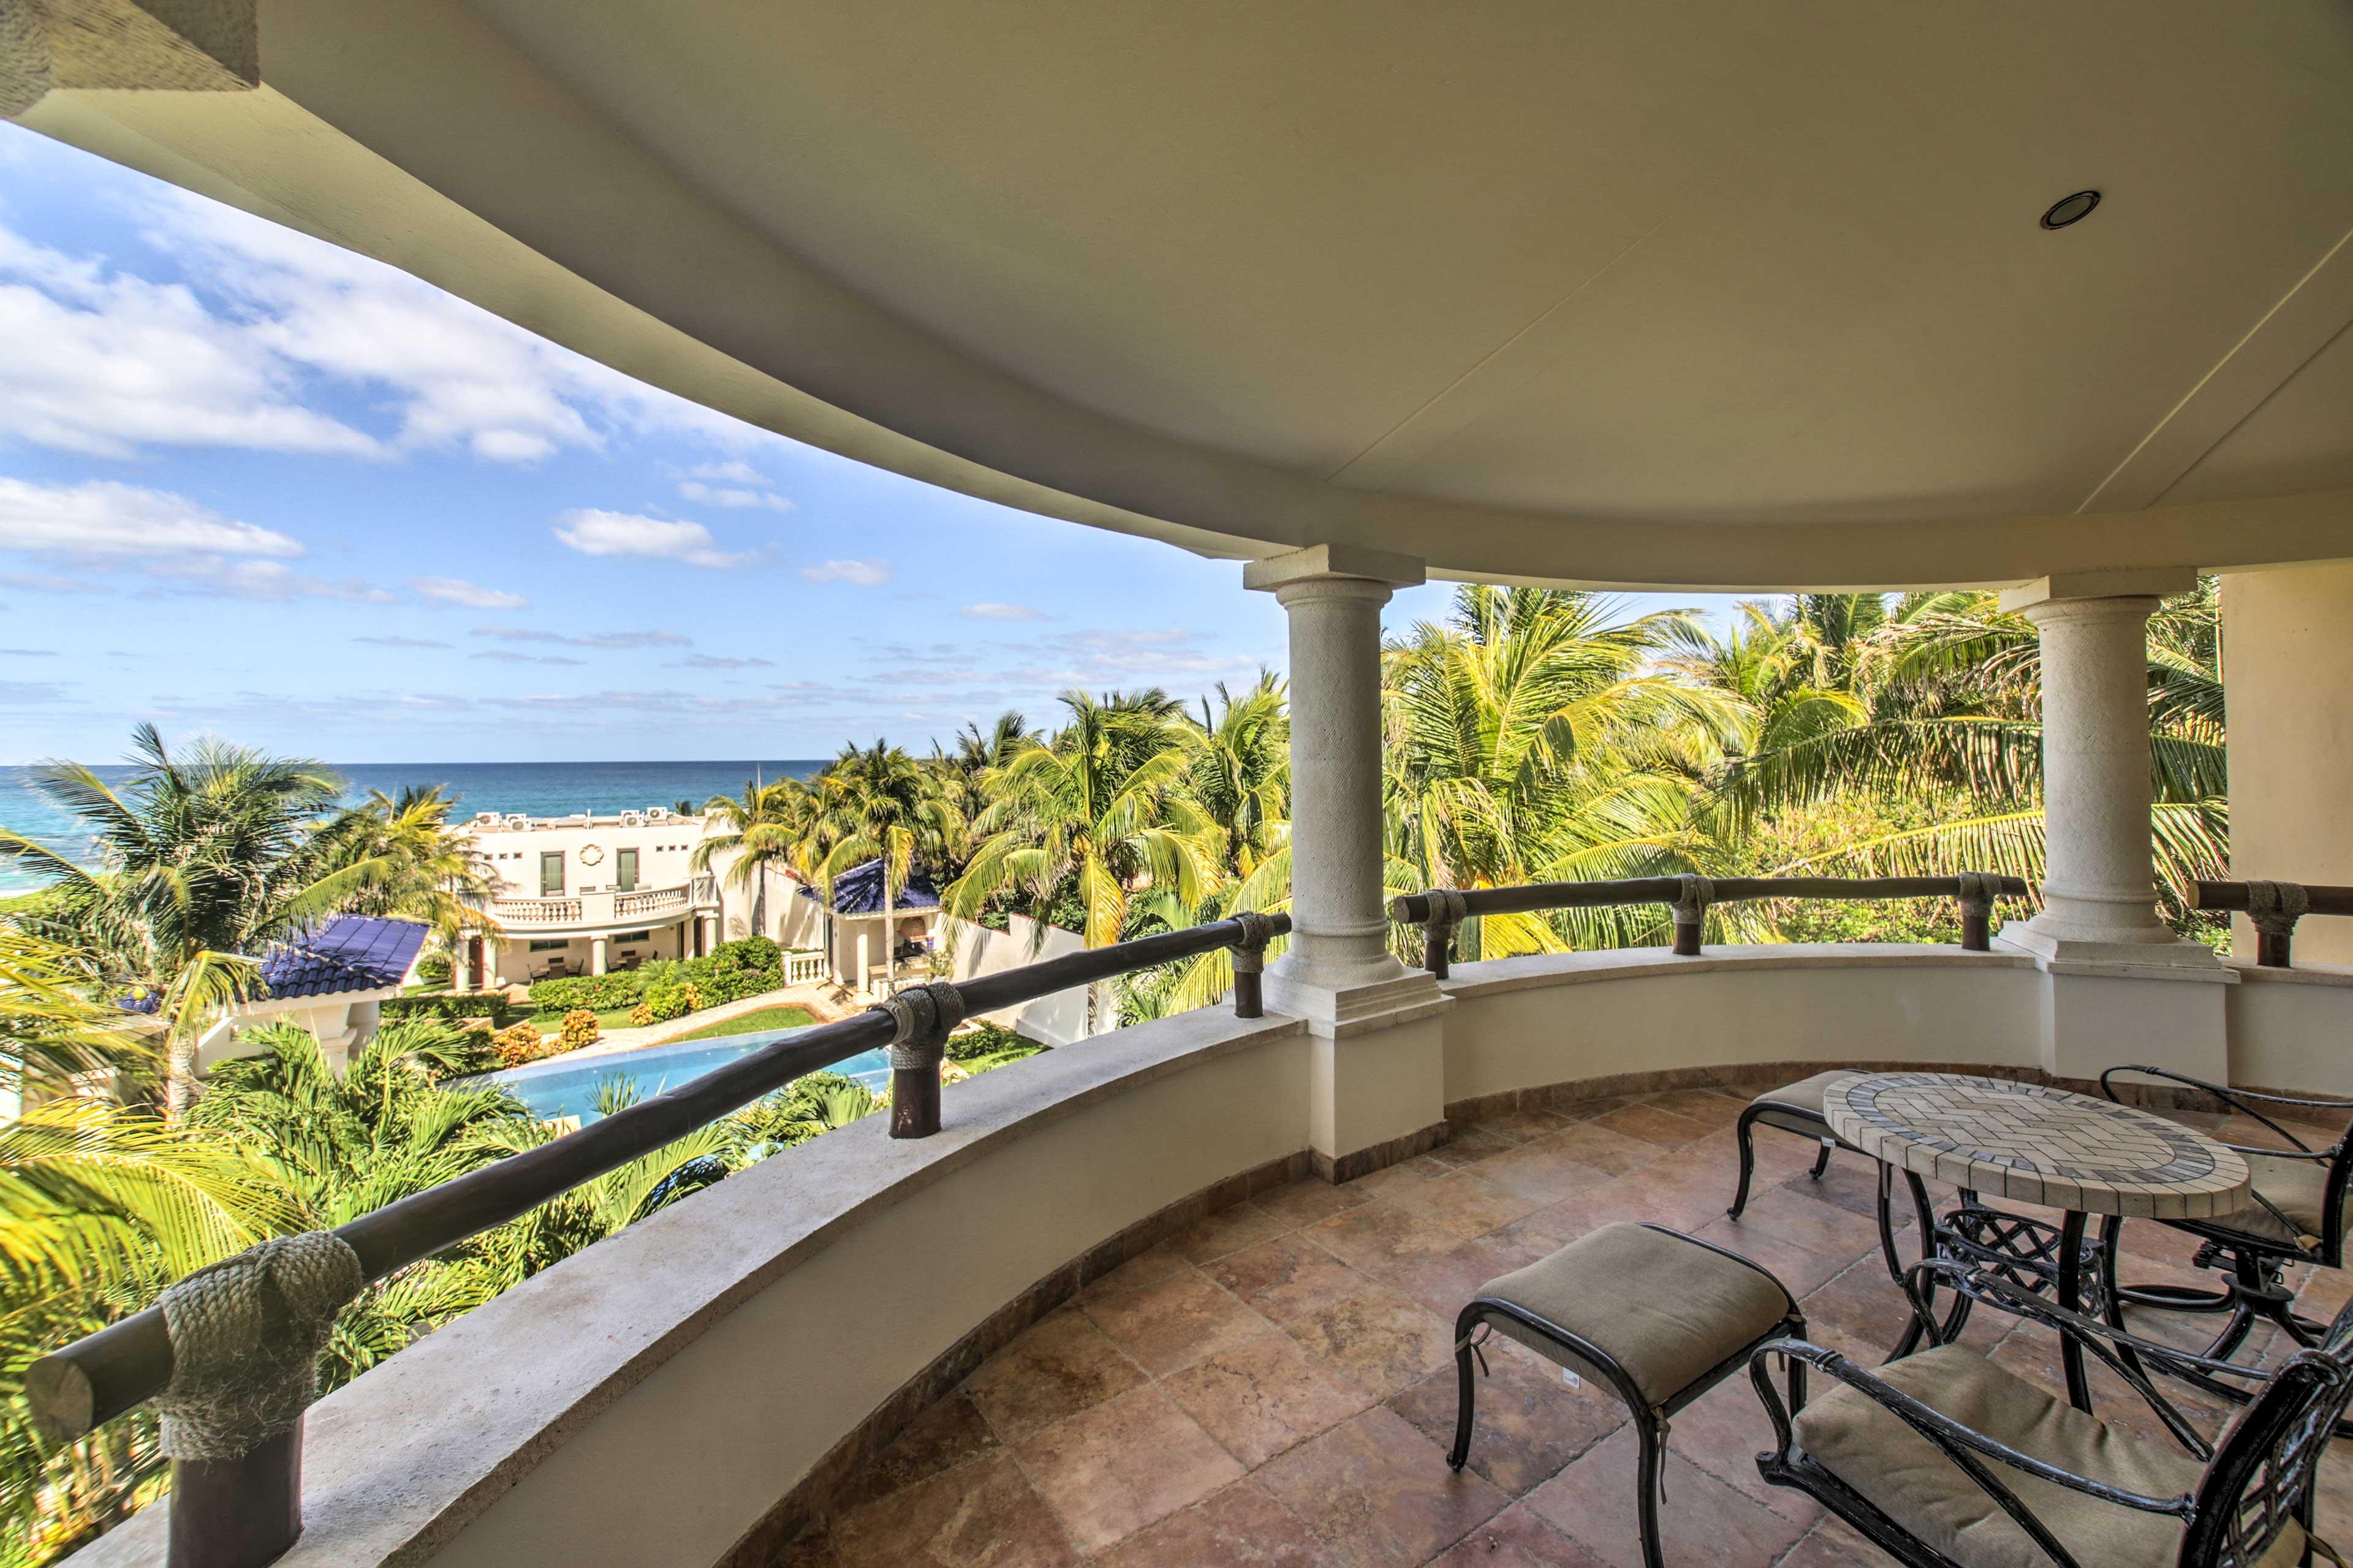 Lounge on the balcony and feel the gentle sea breeze.